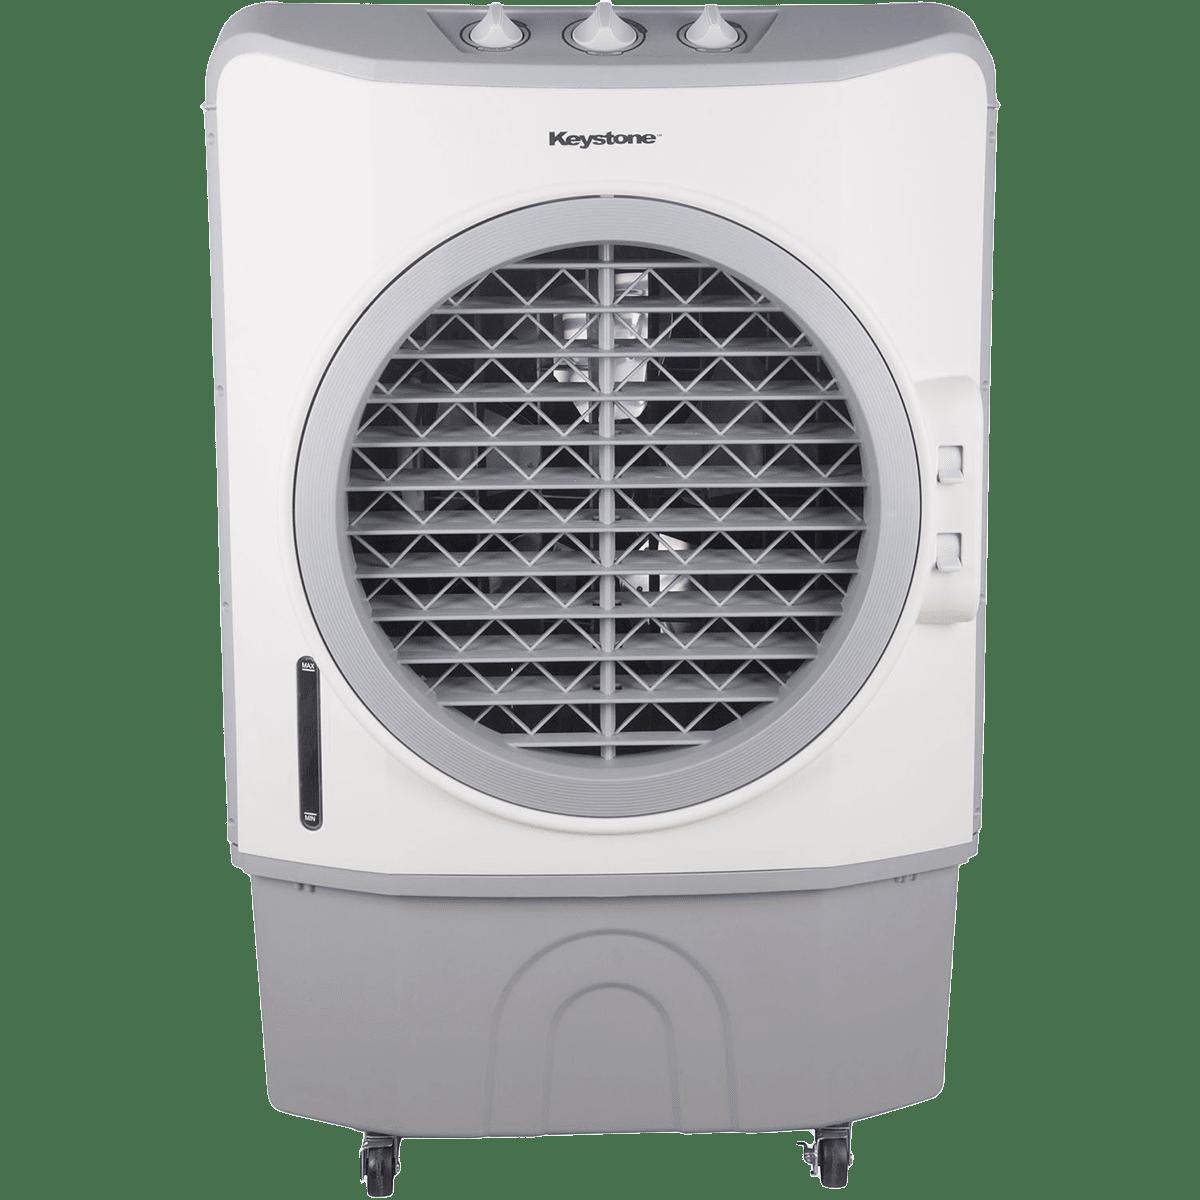 Keystone 40 Liter Outdoor Evaporative Cooler Sylvane